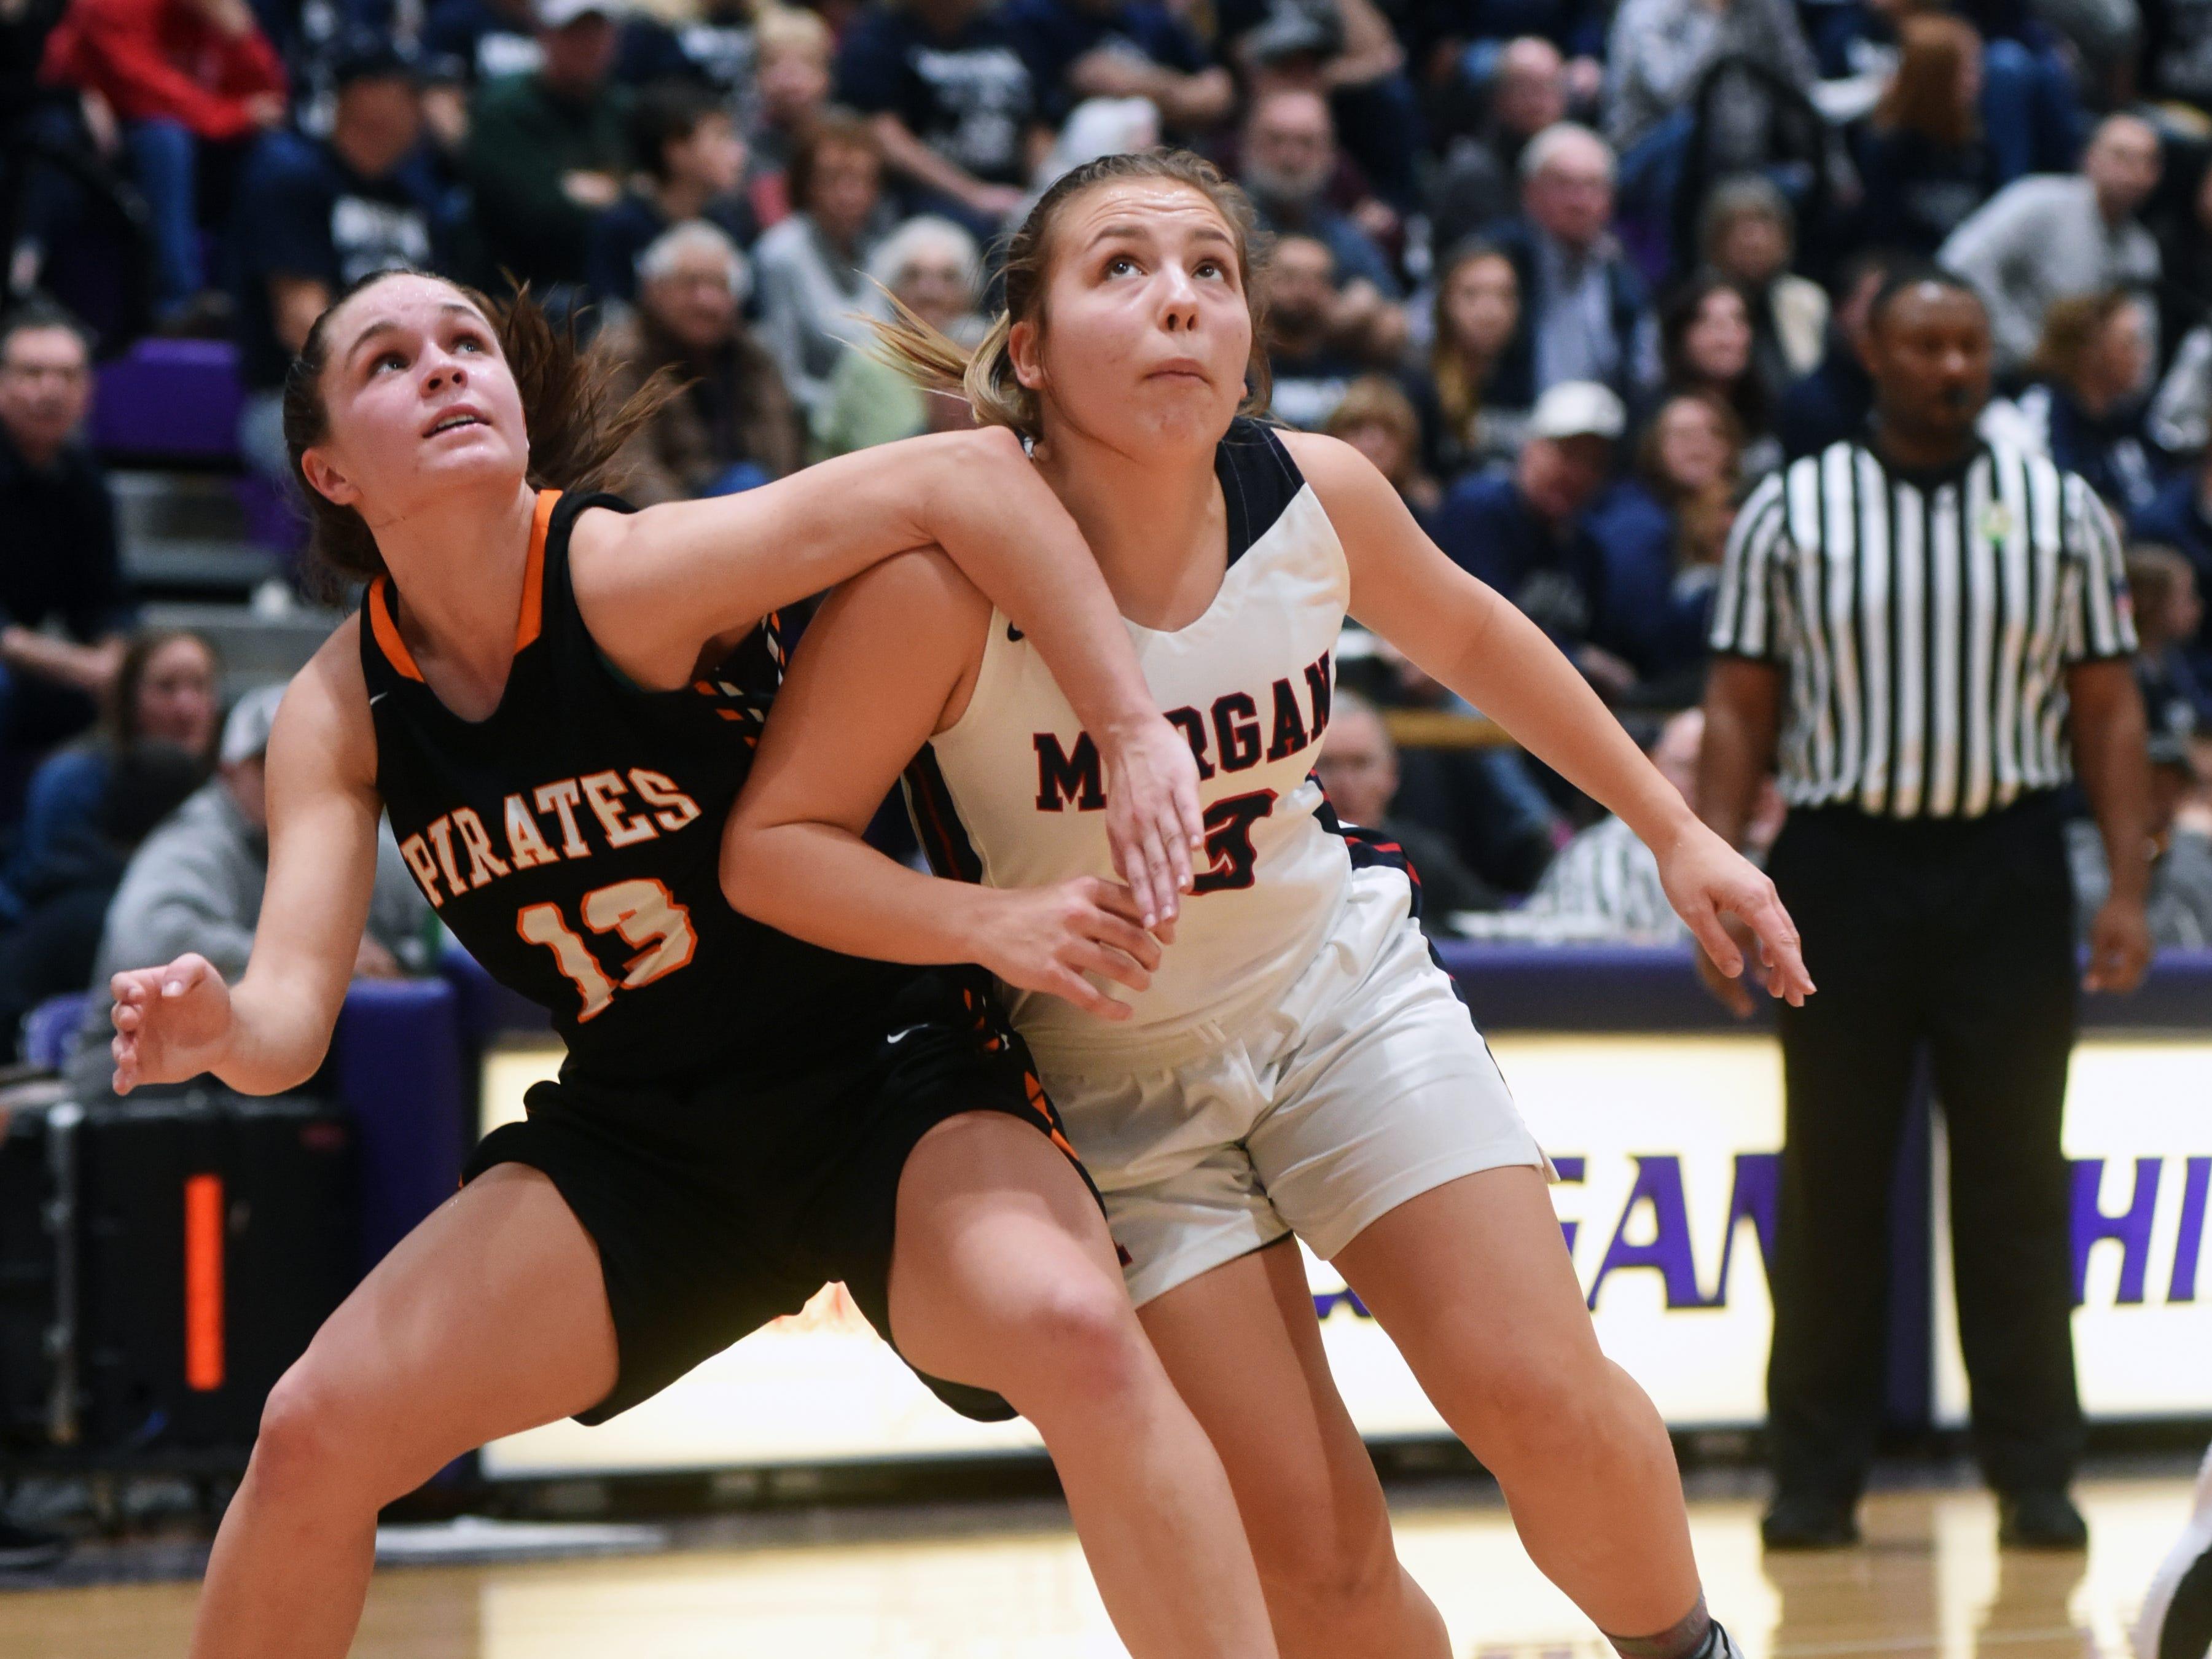 Riley Coon, of Morgan, tries to get rebounding position against Wheelersburg's Abbie Kallner during a Division III regional semifinal at Logan.